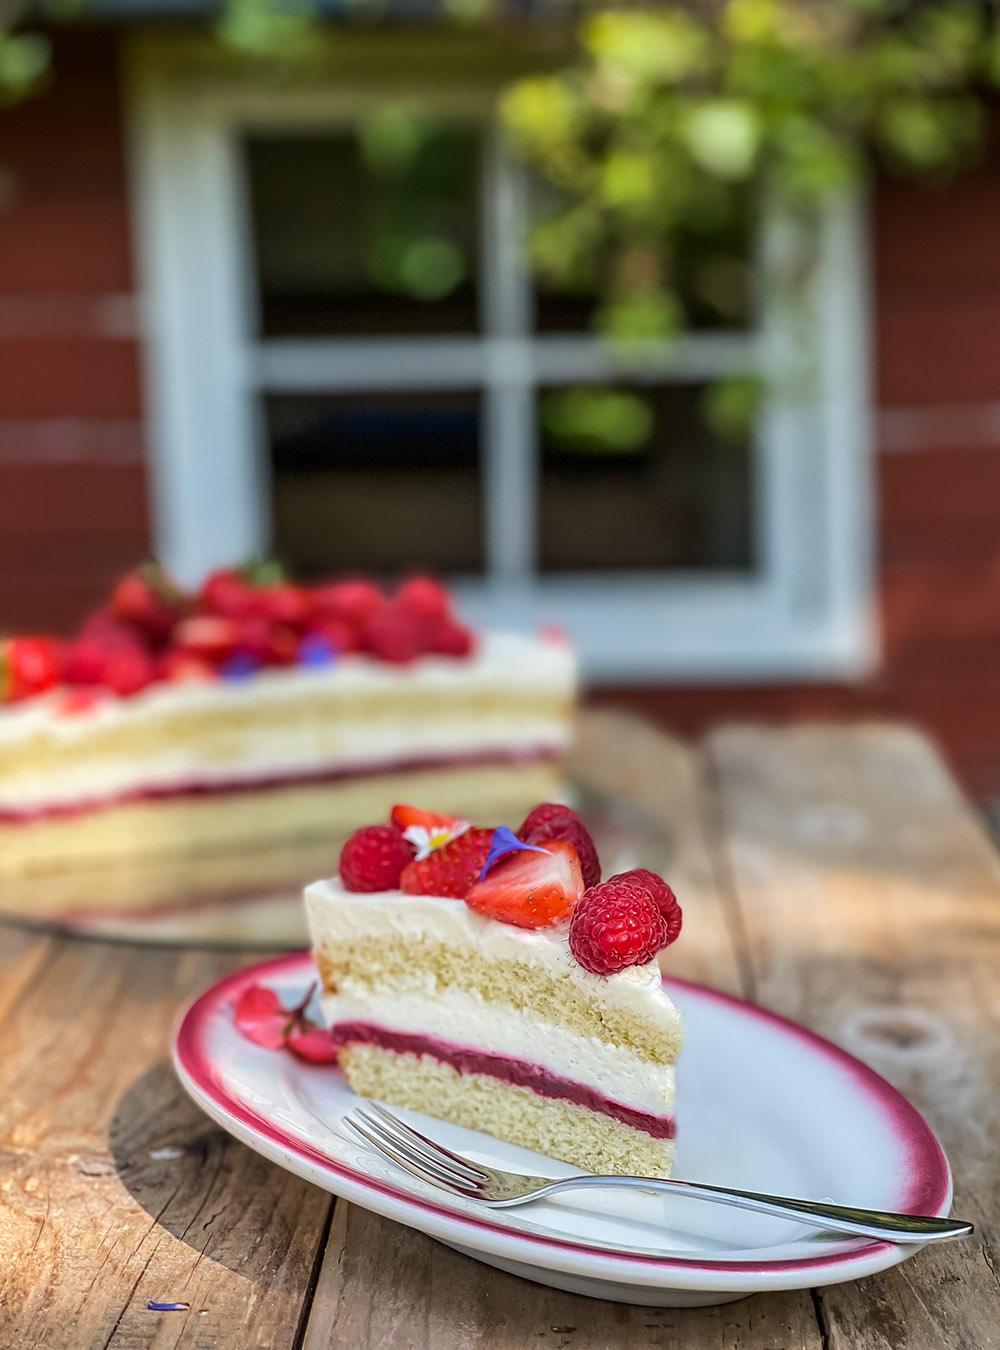 Einfach leckere Himbeer-Erdbeer-Torte